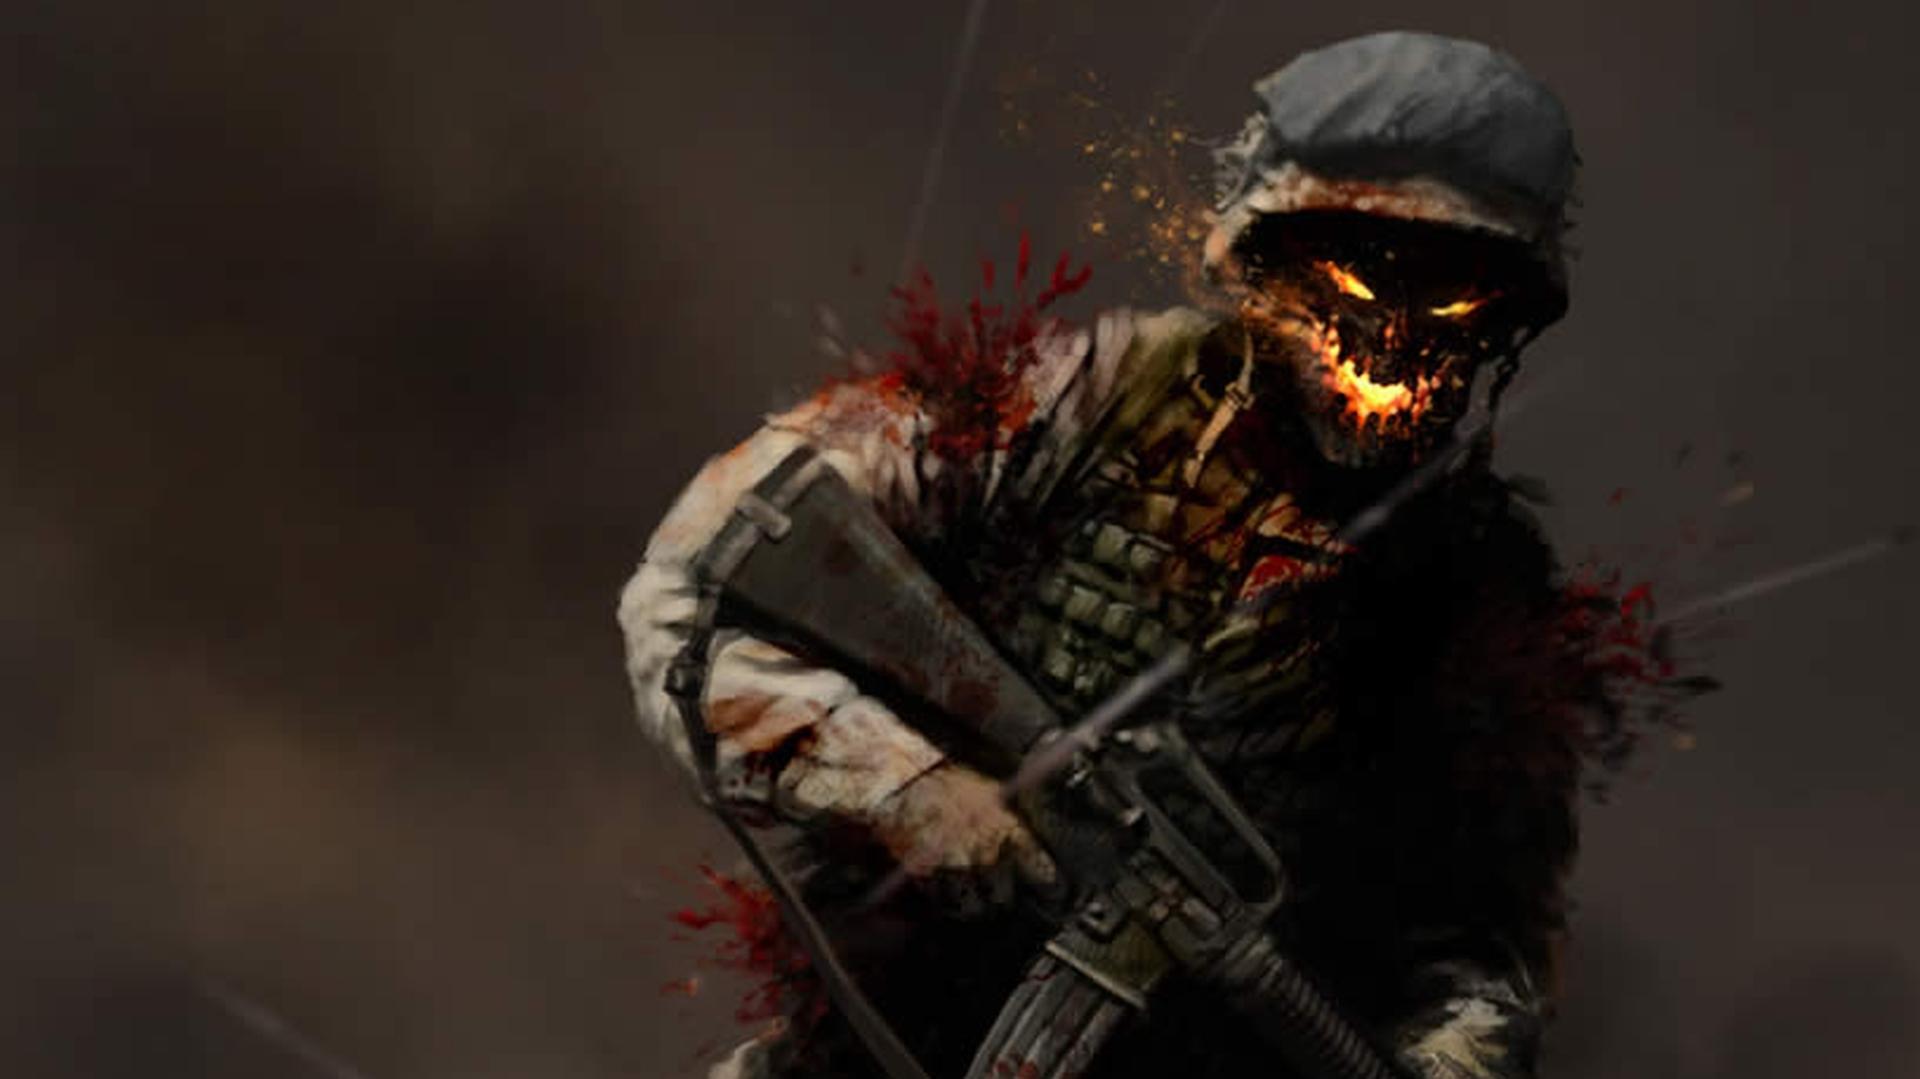 dark warrior horror weapons guns art demon wallpaper